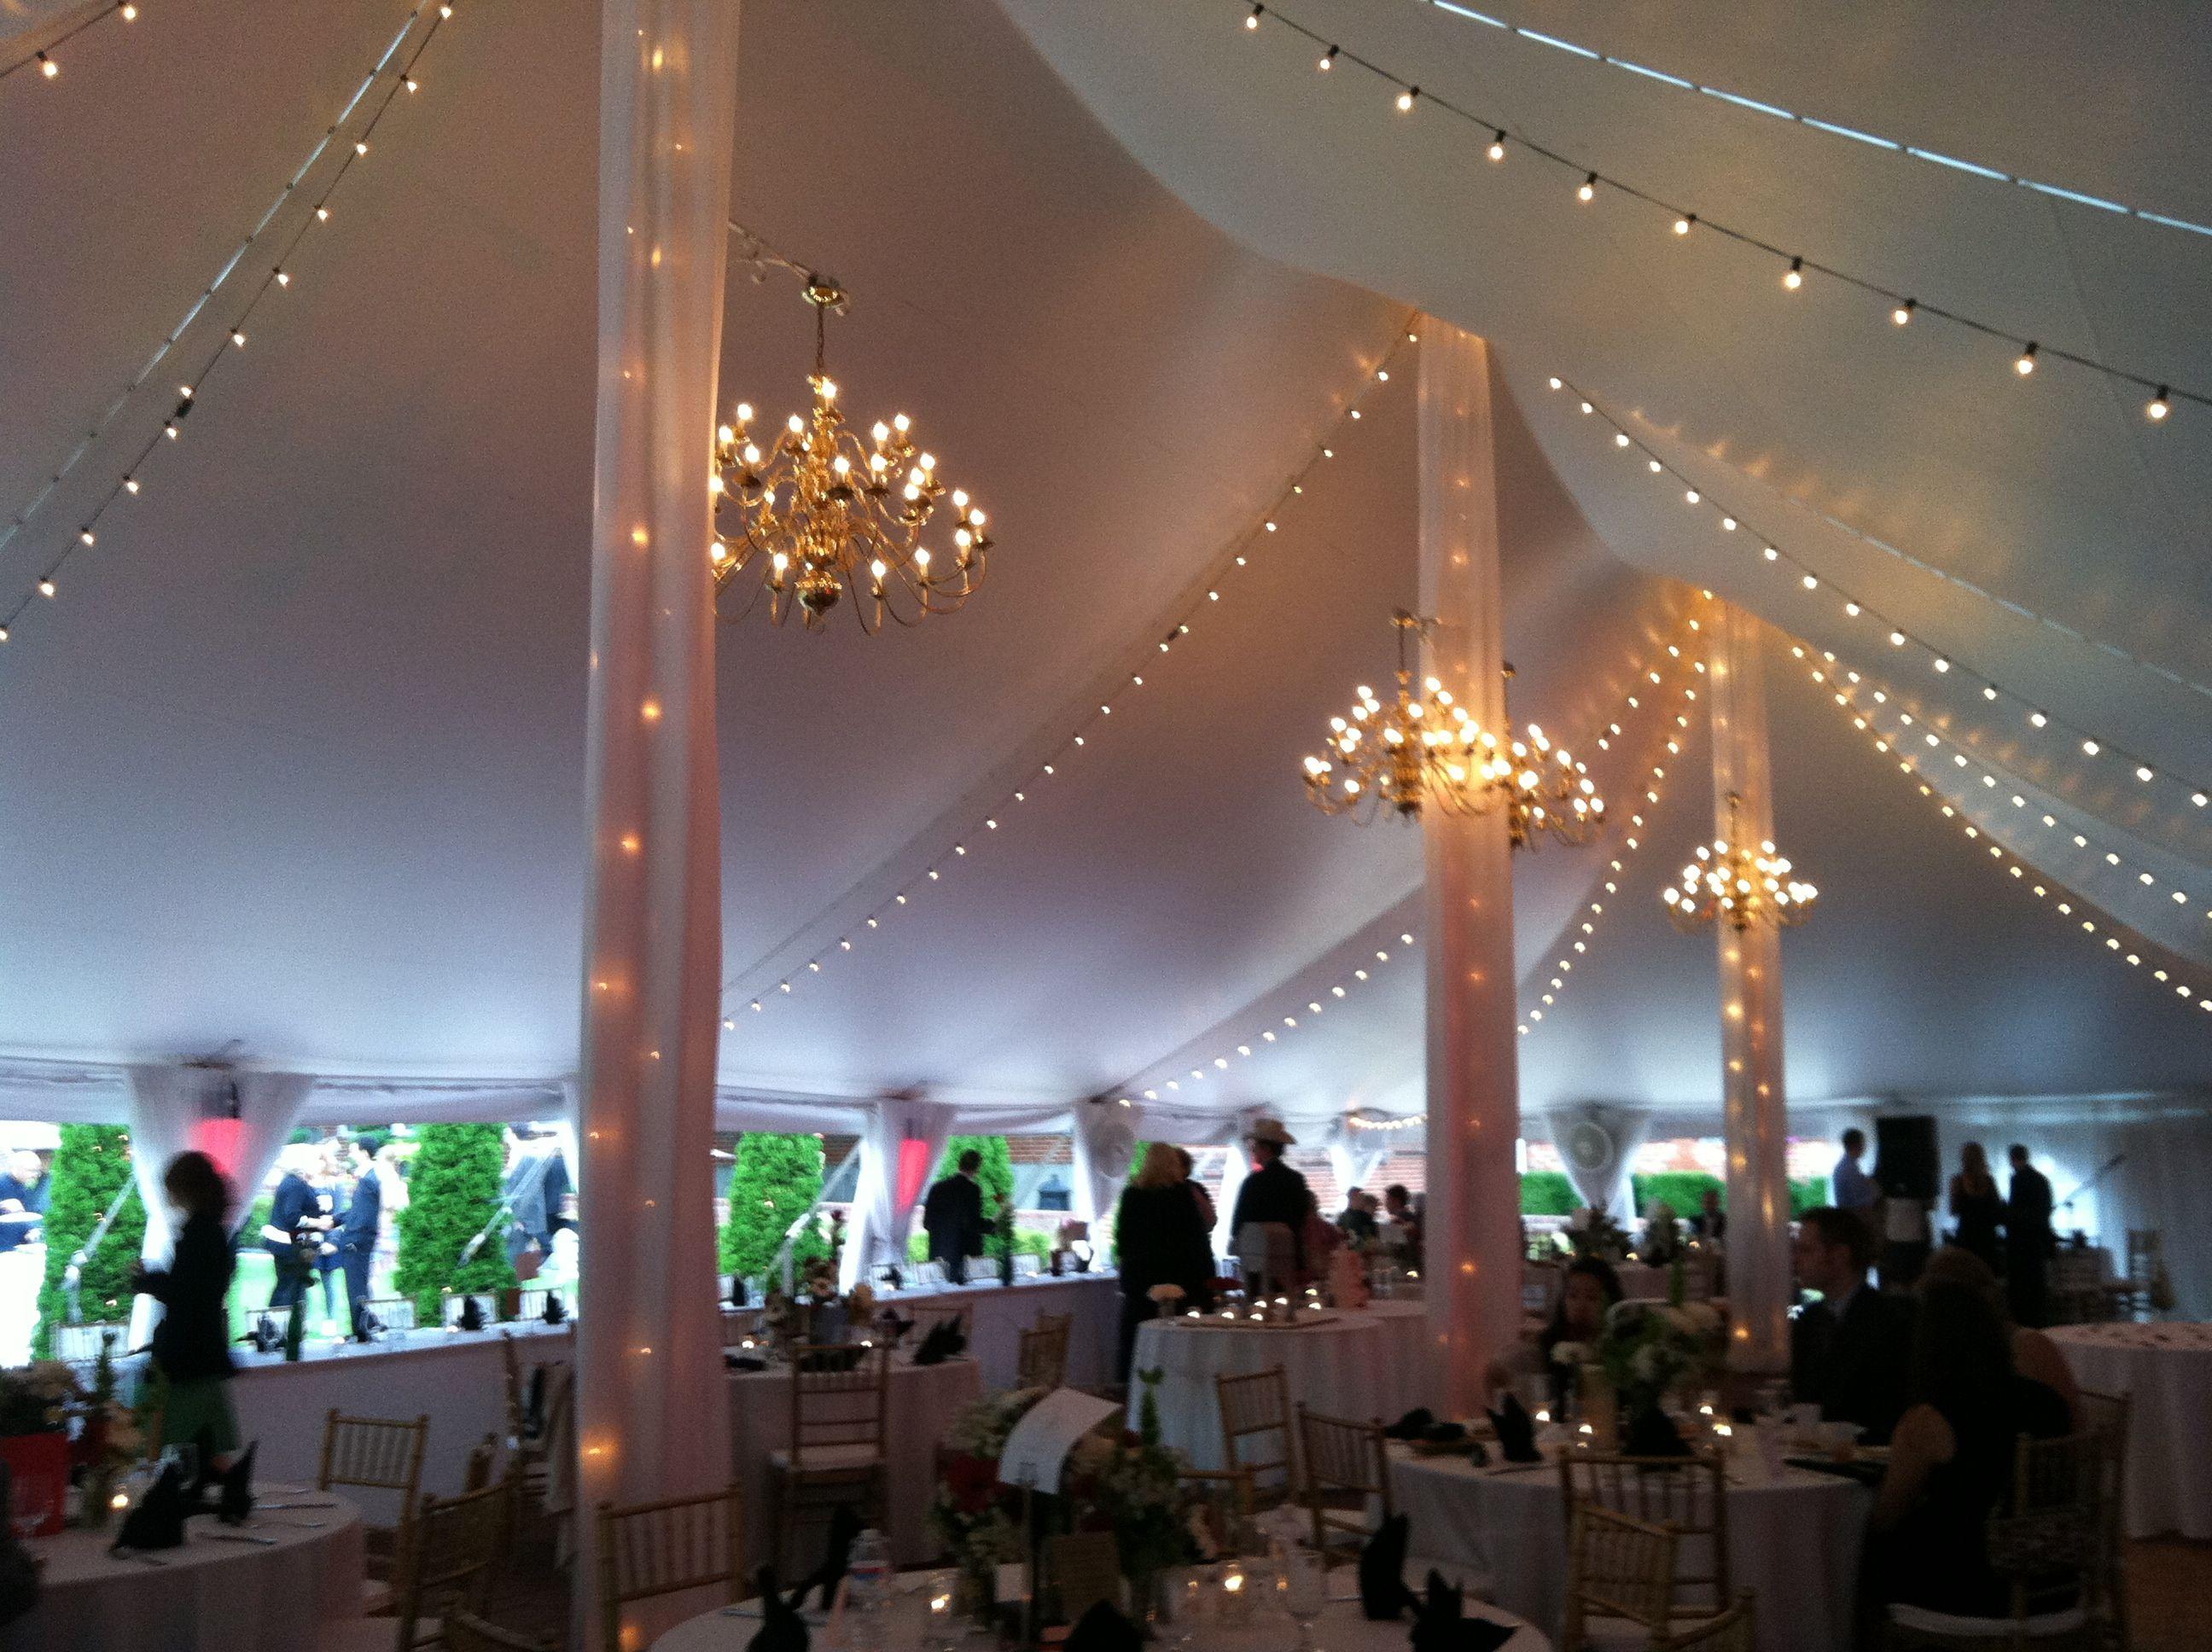 Wedding tent decoration images  Tent decoration for weddings  Vineyard Ideas  Pinterest  Tent